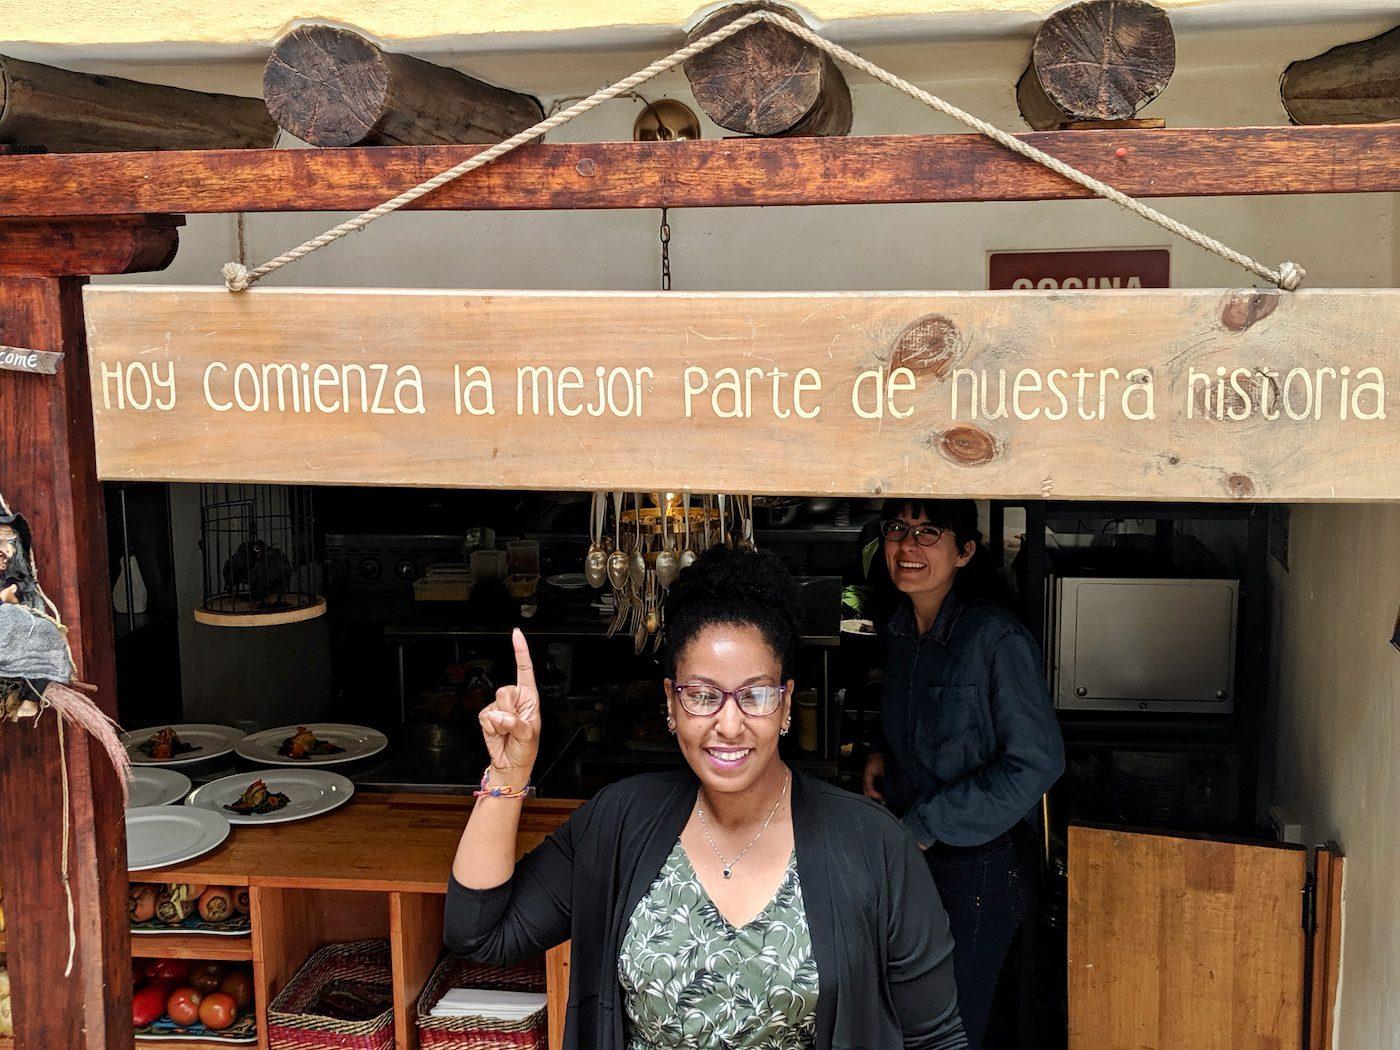 At La Bruja (The Witch) restaurant in the La Candelaria neighborhood of Bogota.